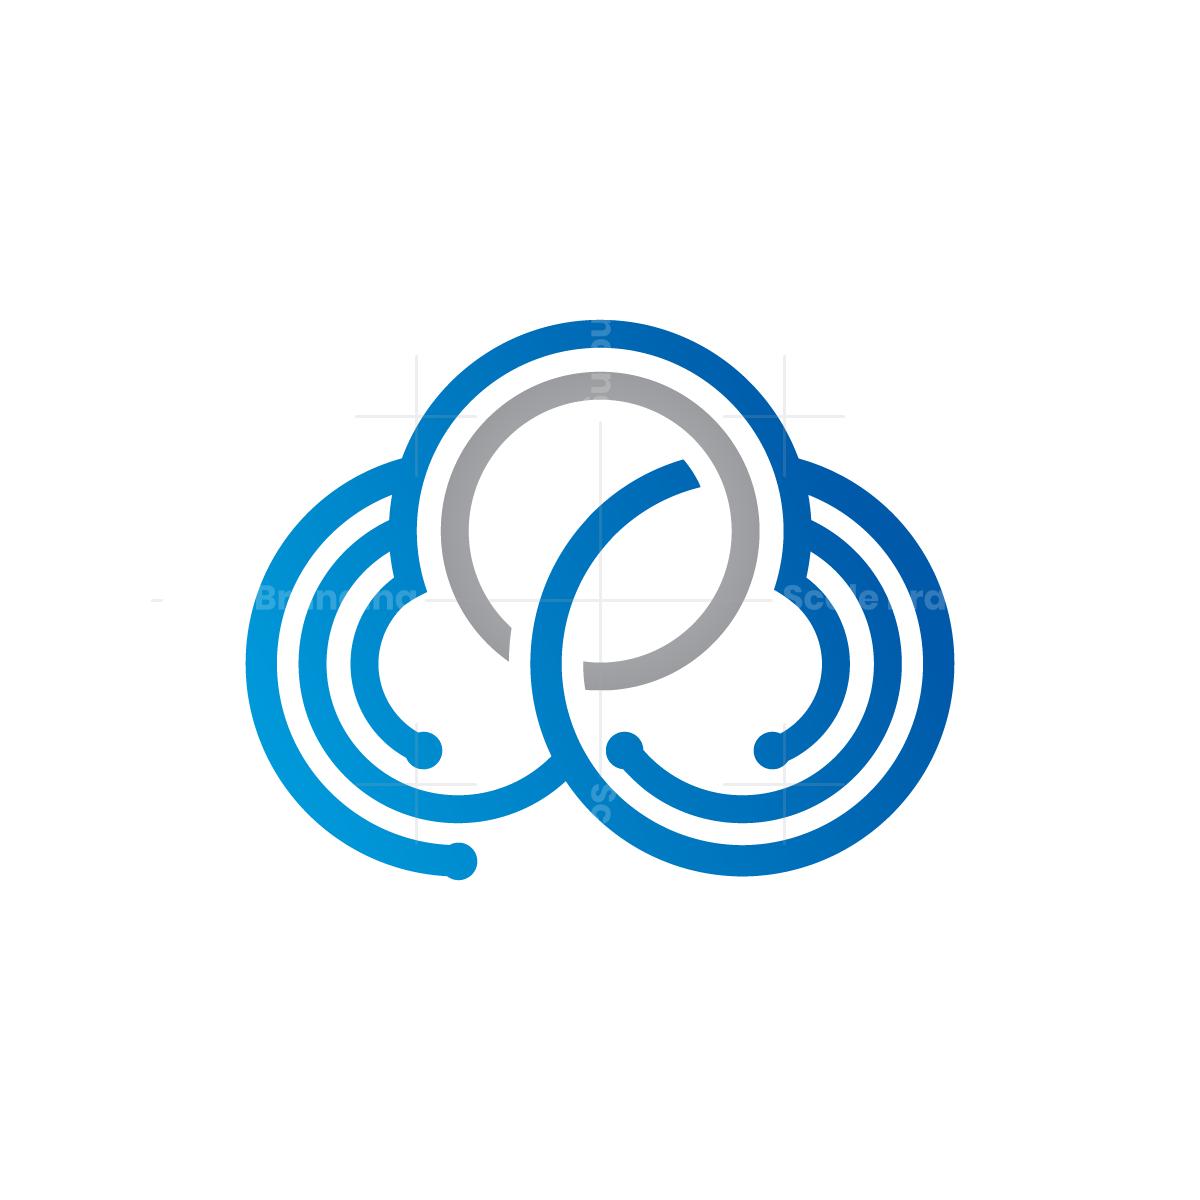 Tech Cloud Logo Logo Cloud Clouds Design Clouds